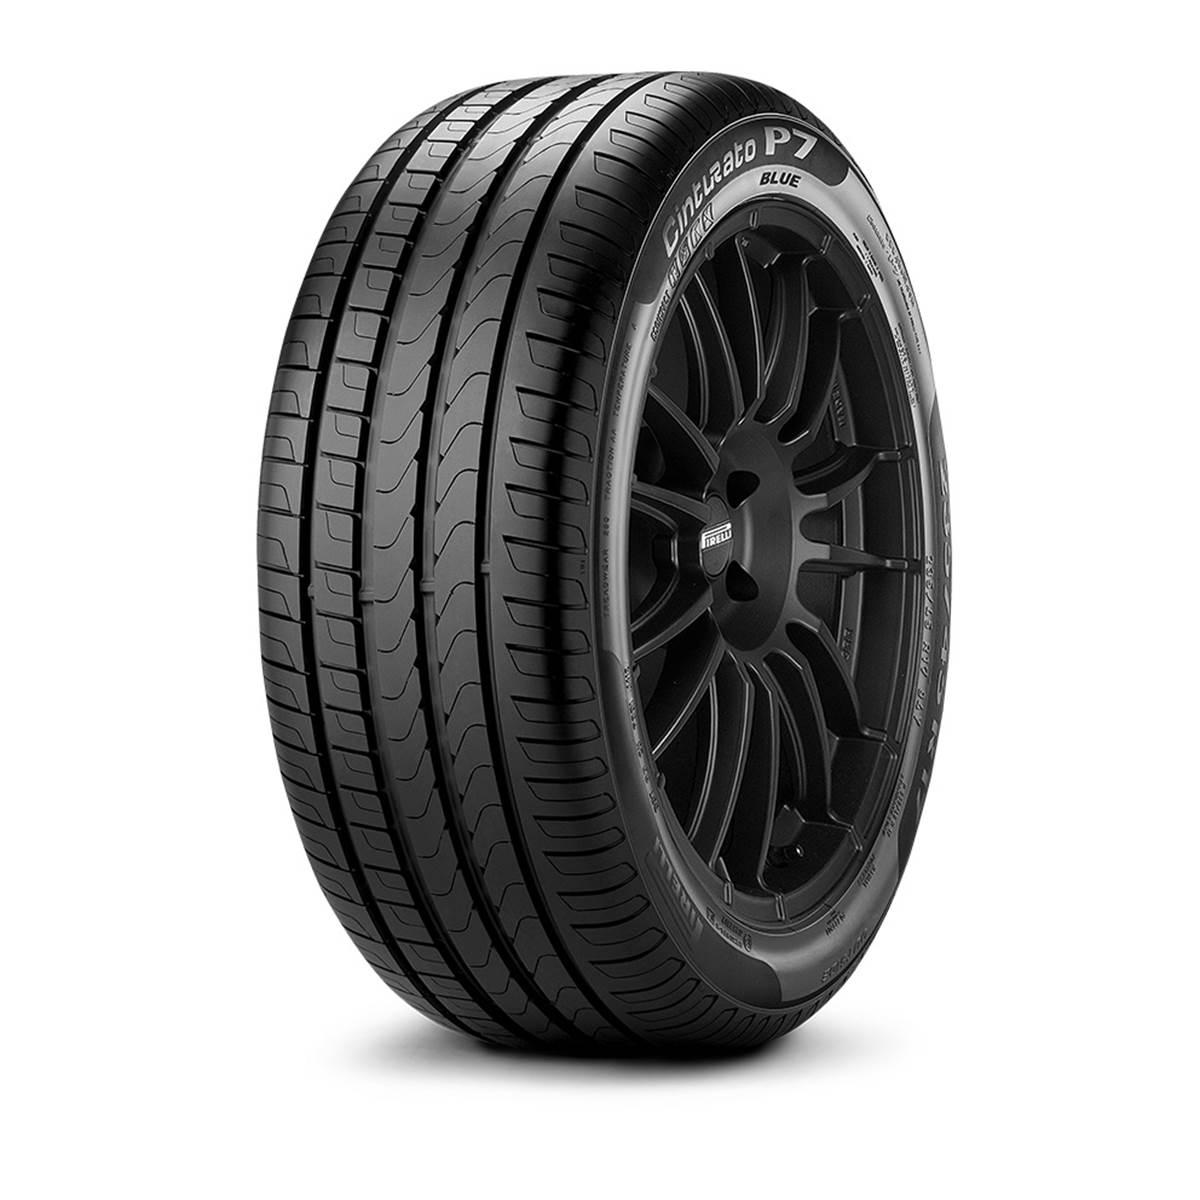 Pneu Pirelli 225/55R17 101W Cinturato P7 Blue XL